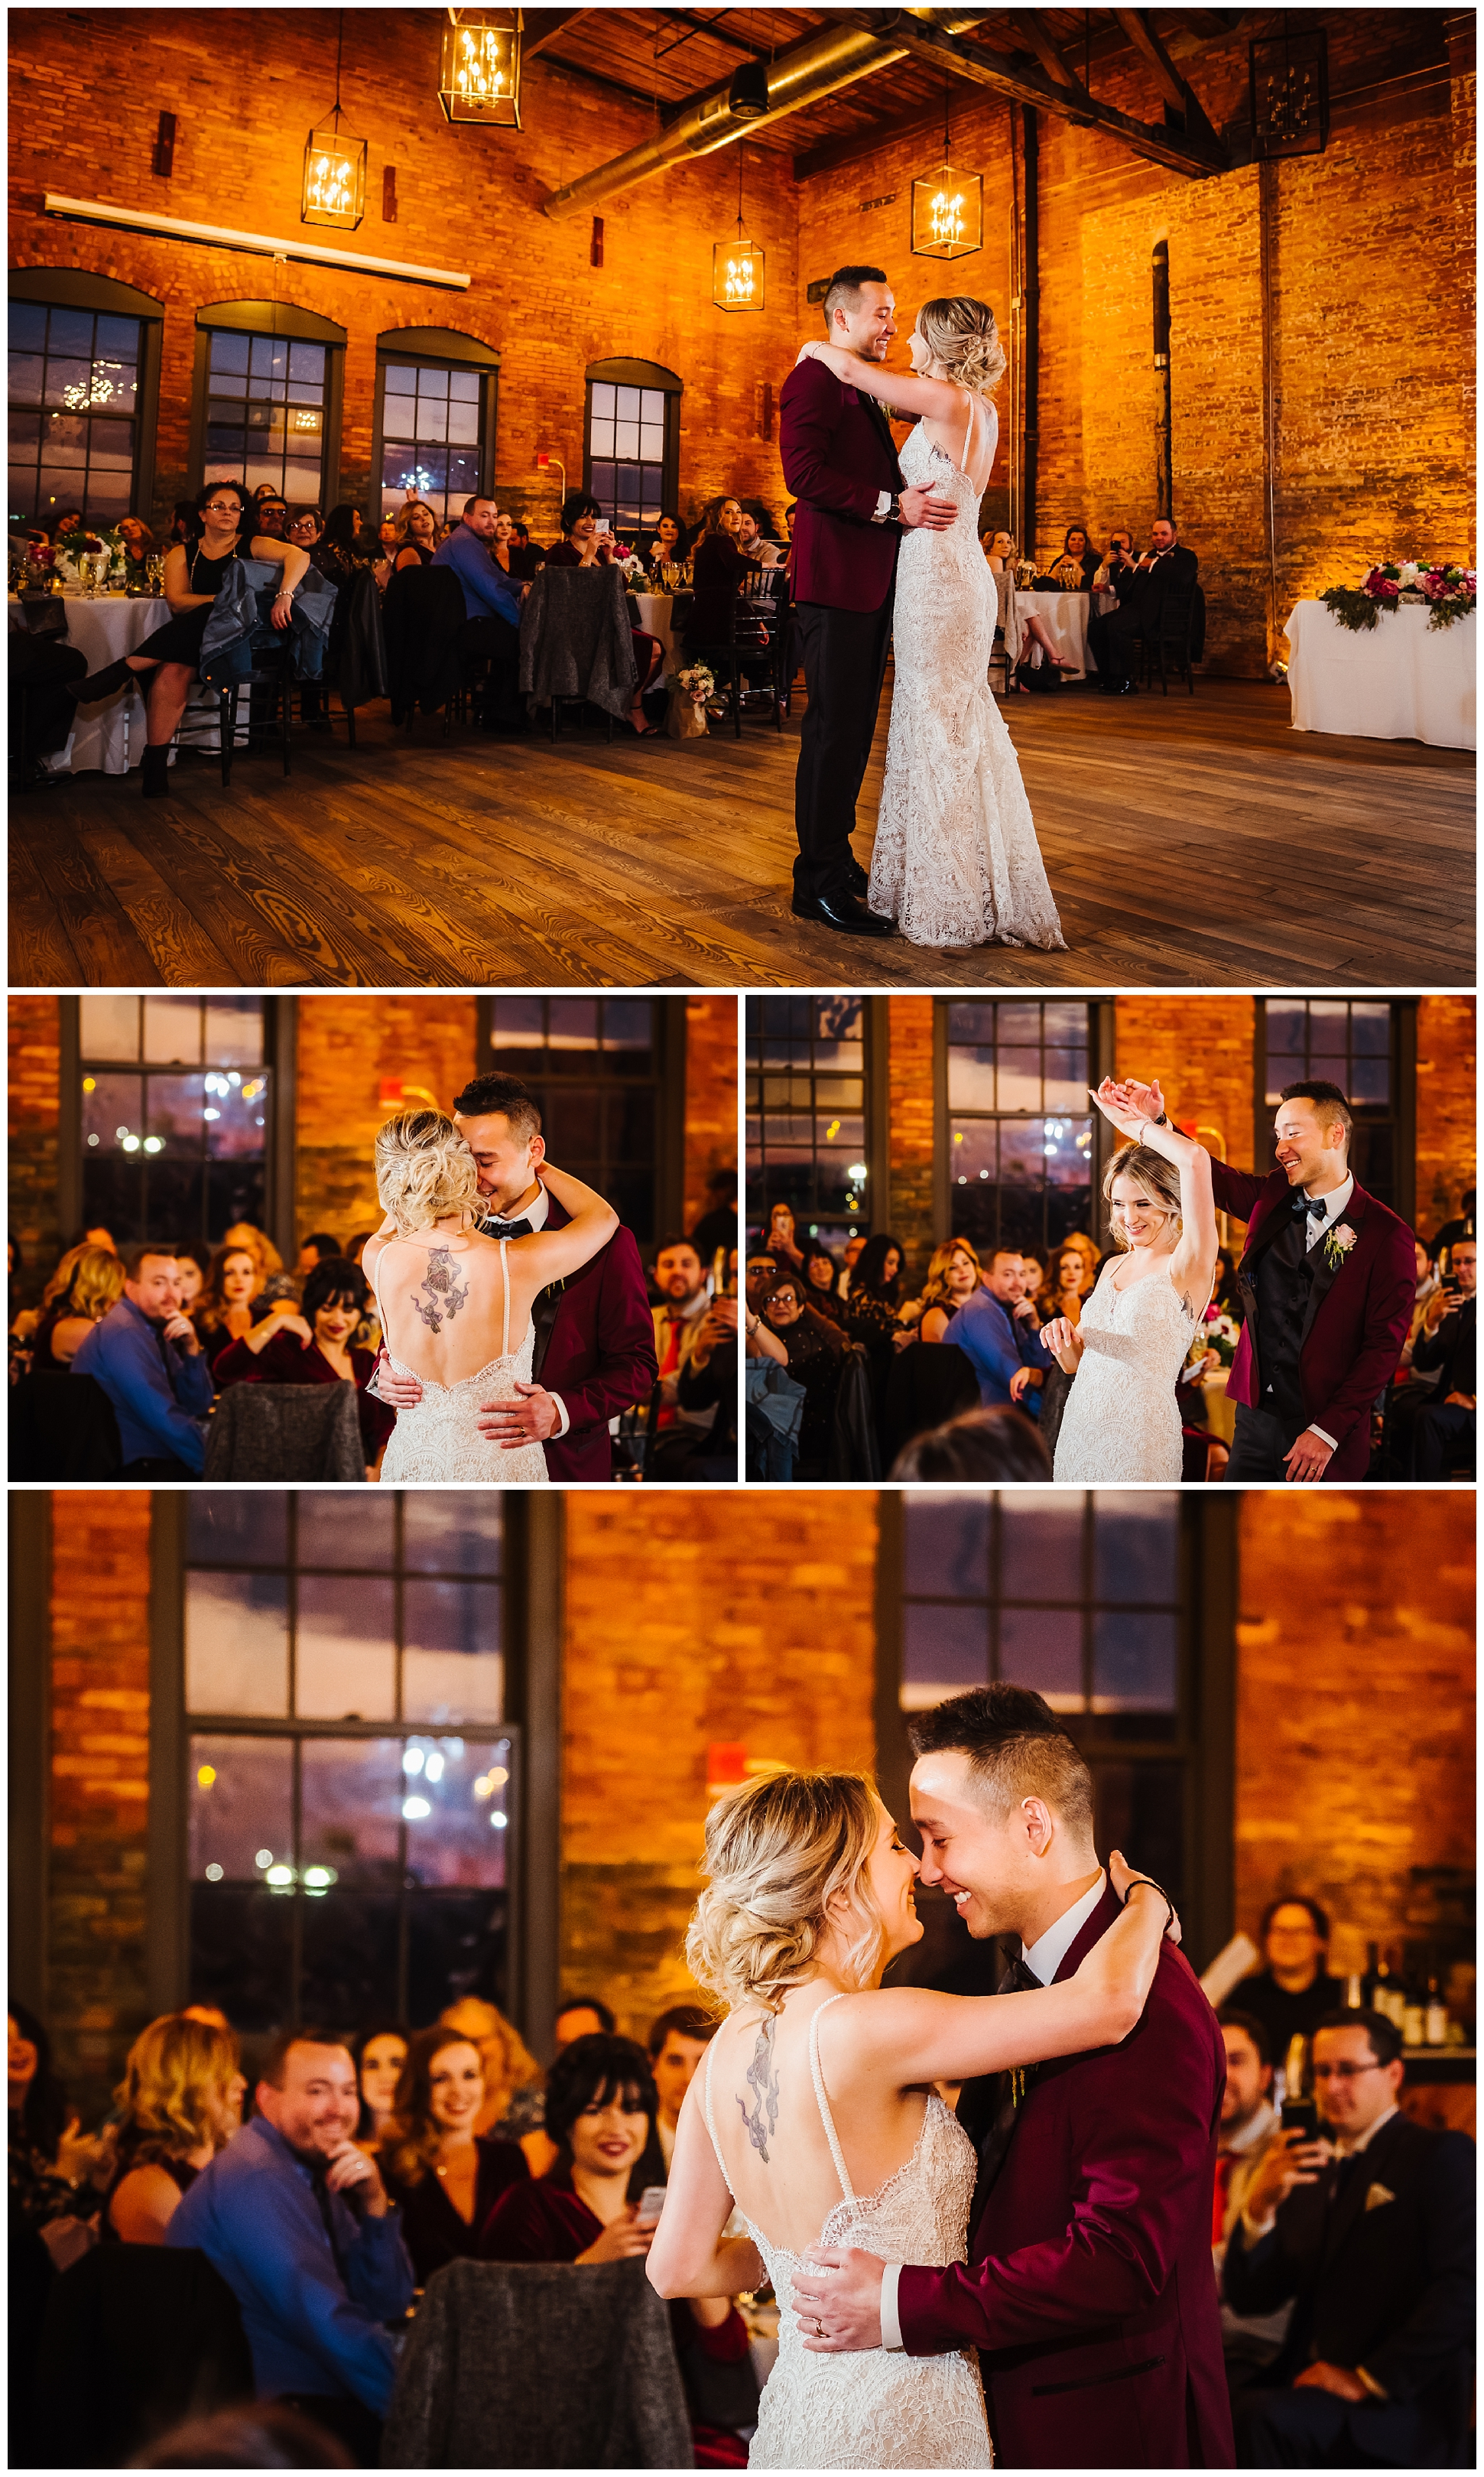 tampa-armeture-wedding-photographer-edgy-industrial-downtown-fancy-free-nursery-tattoo-burgandy-velvet_0070.jpg